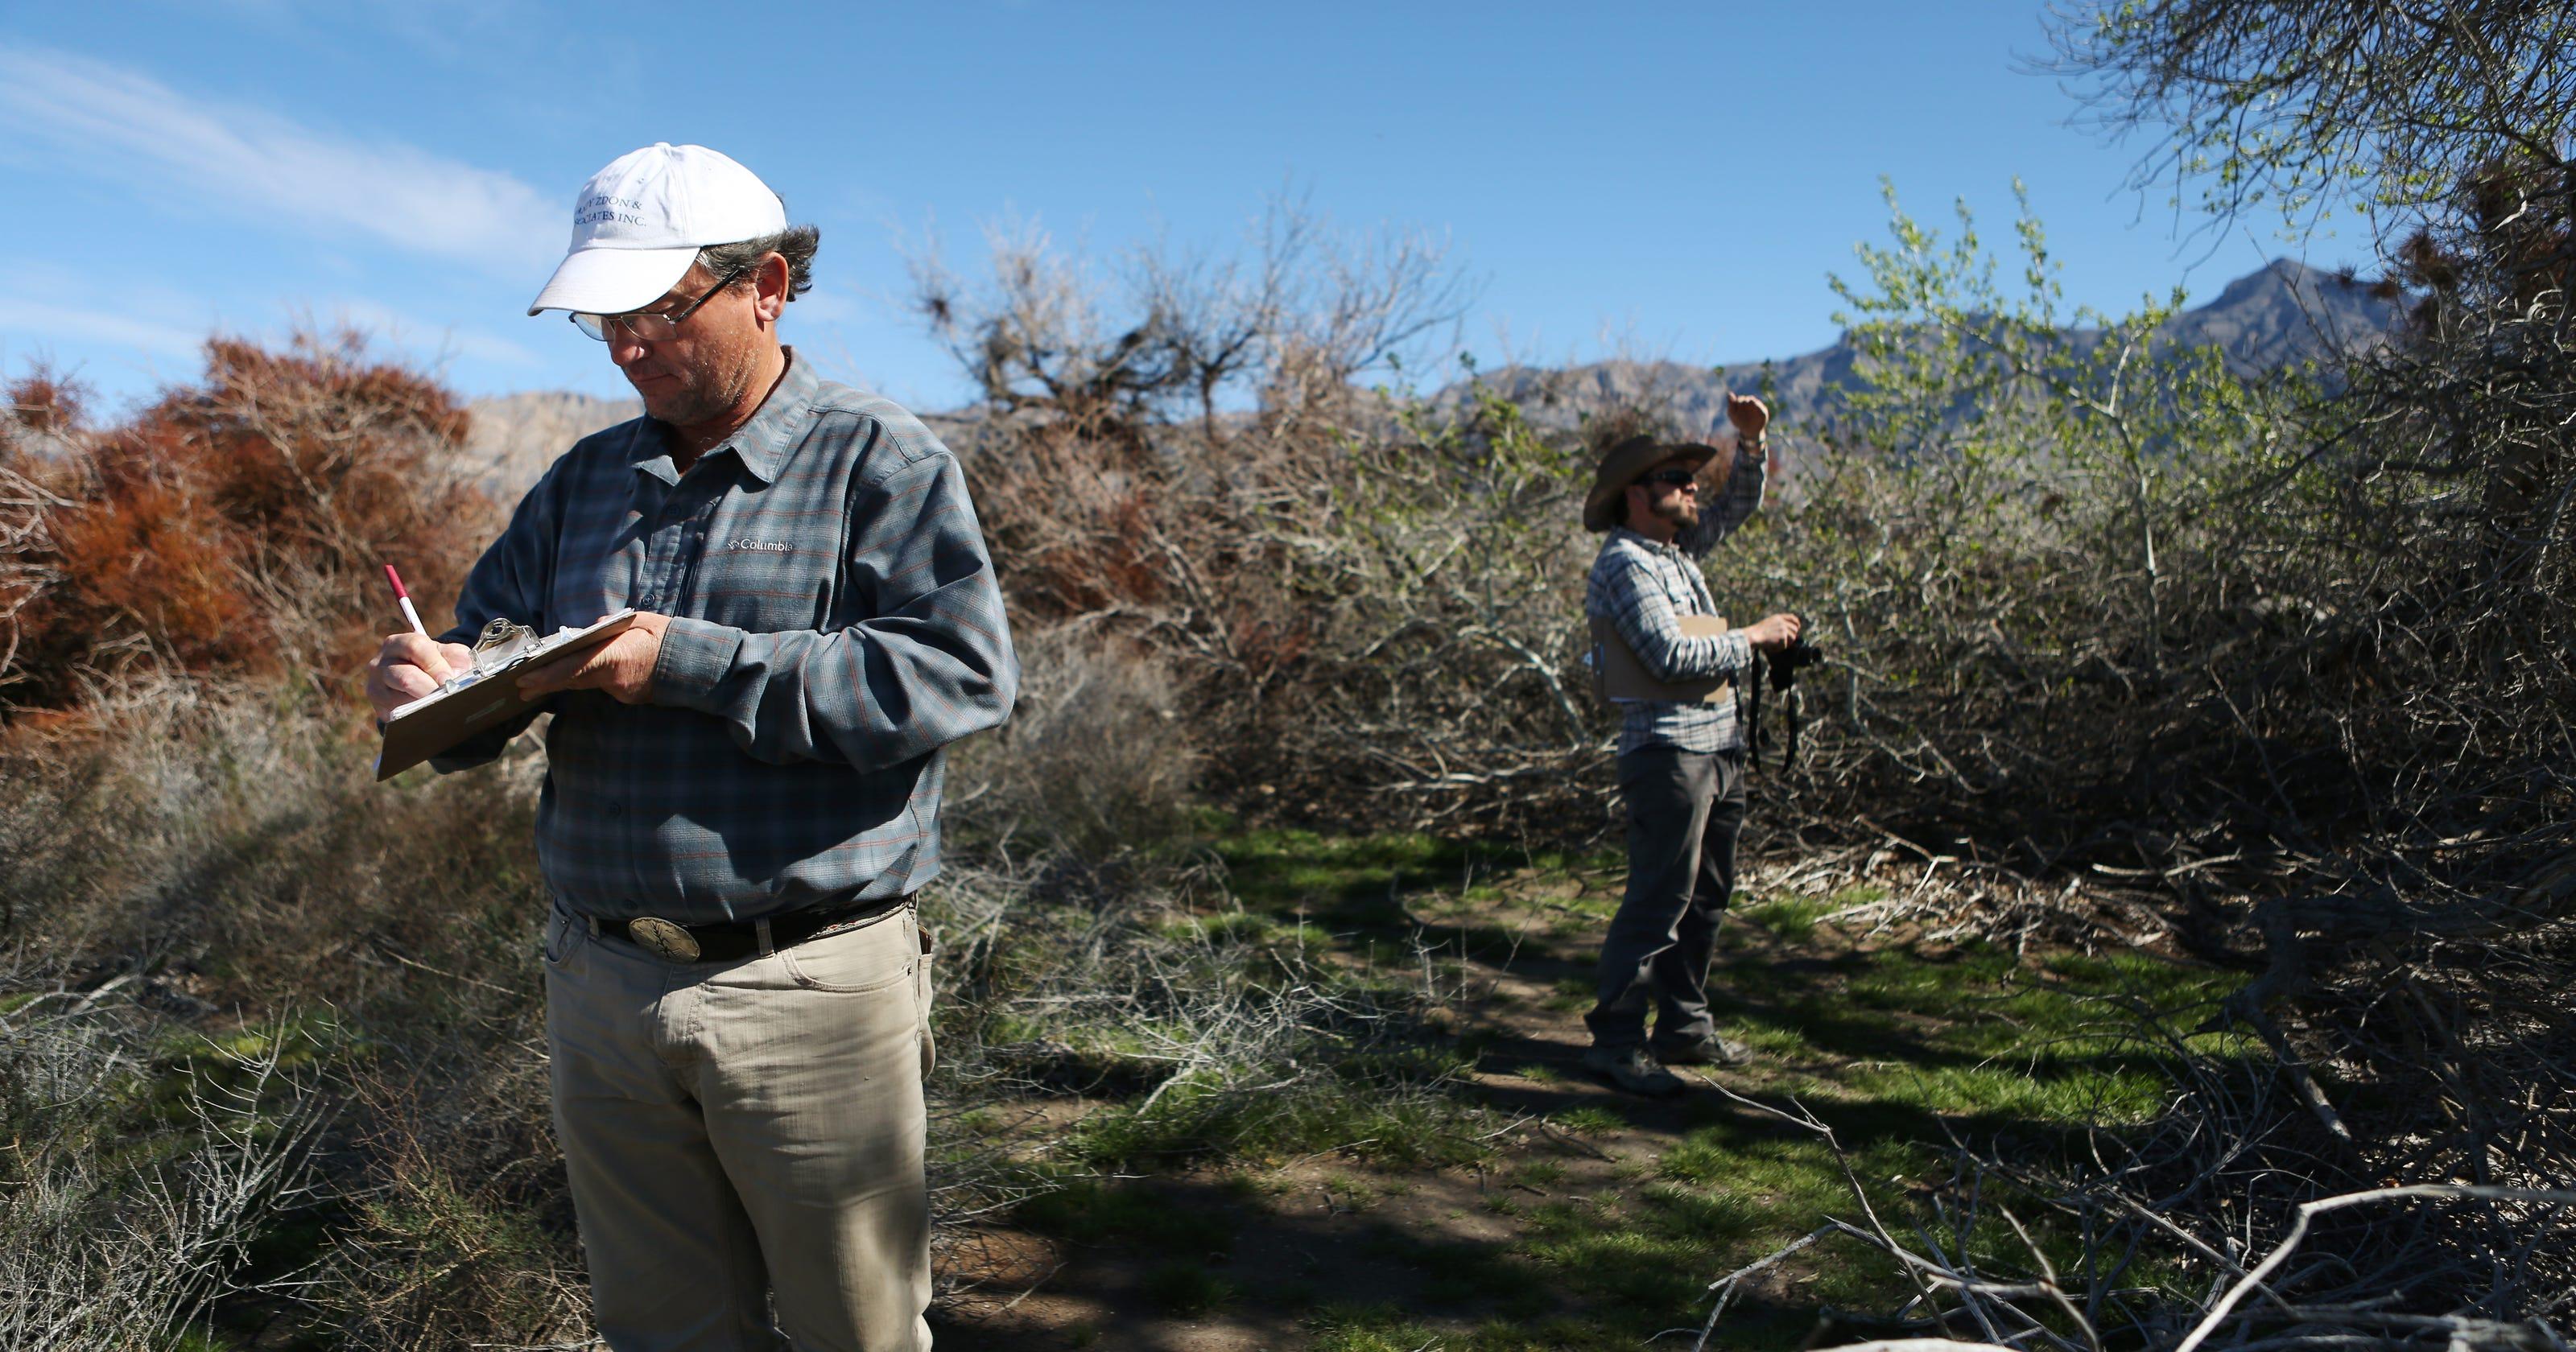 Researchers map springs across the Mojave Desert on mojave nevada map, mojave trail map, mojave road map, mojave land map, mojave dessert map, mojave rattlesnake,